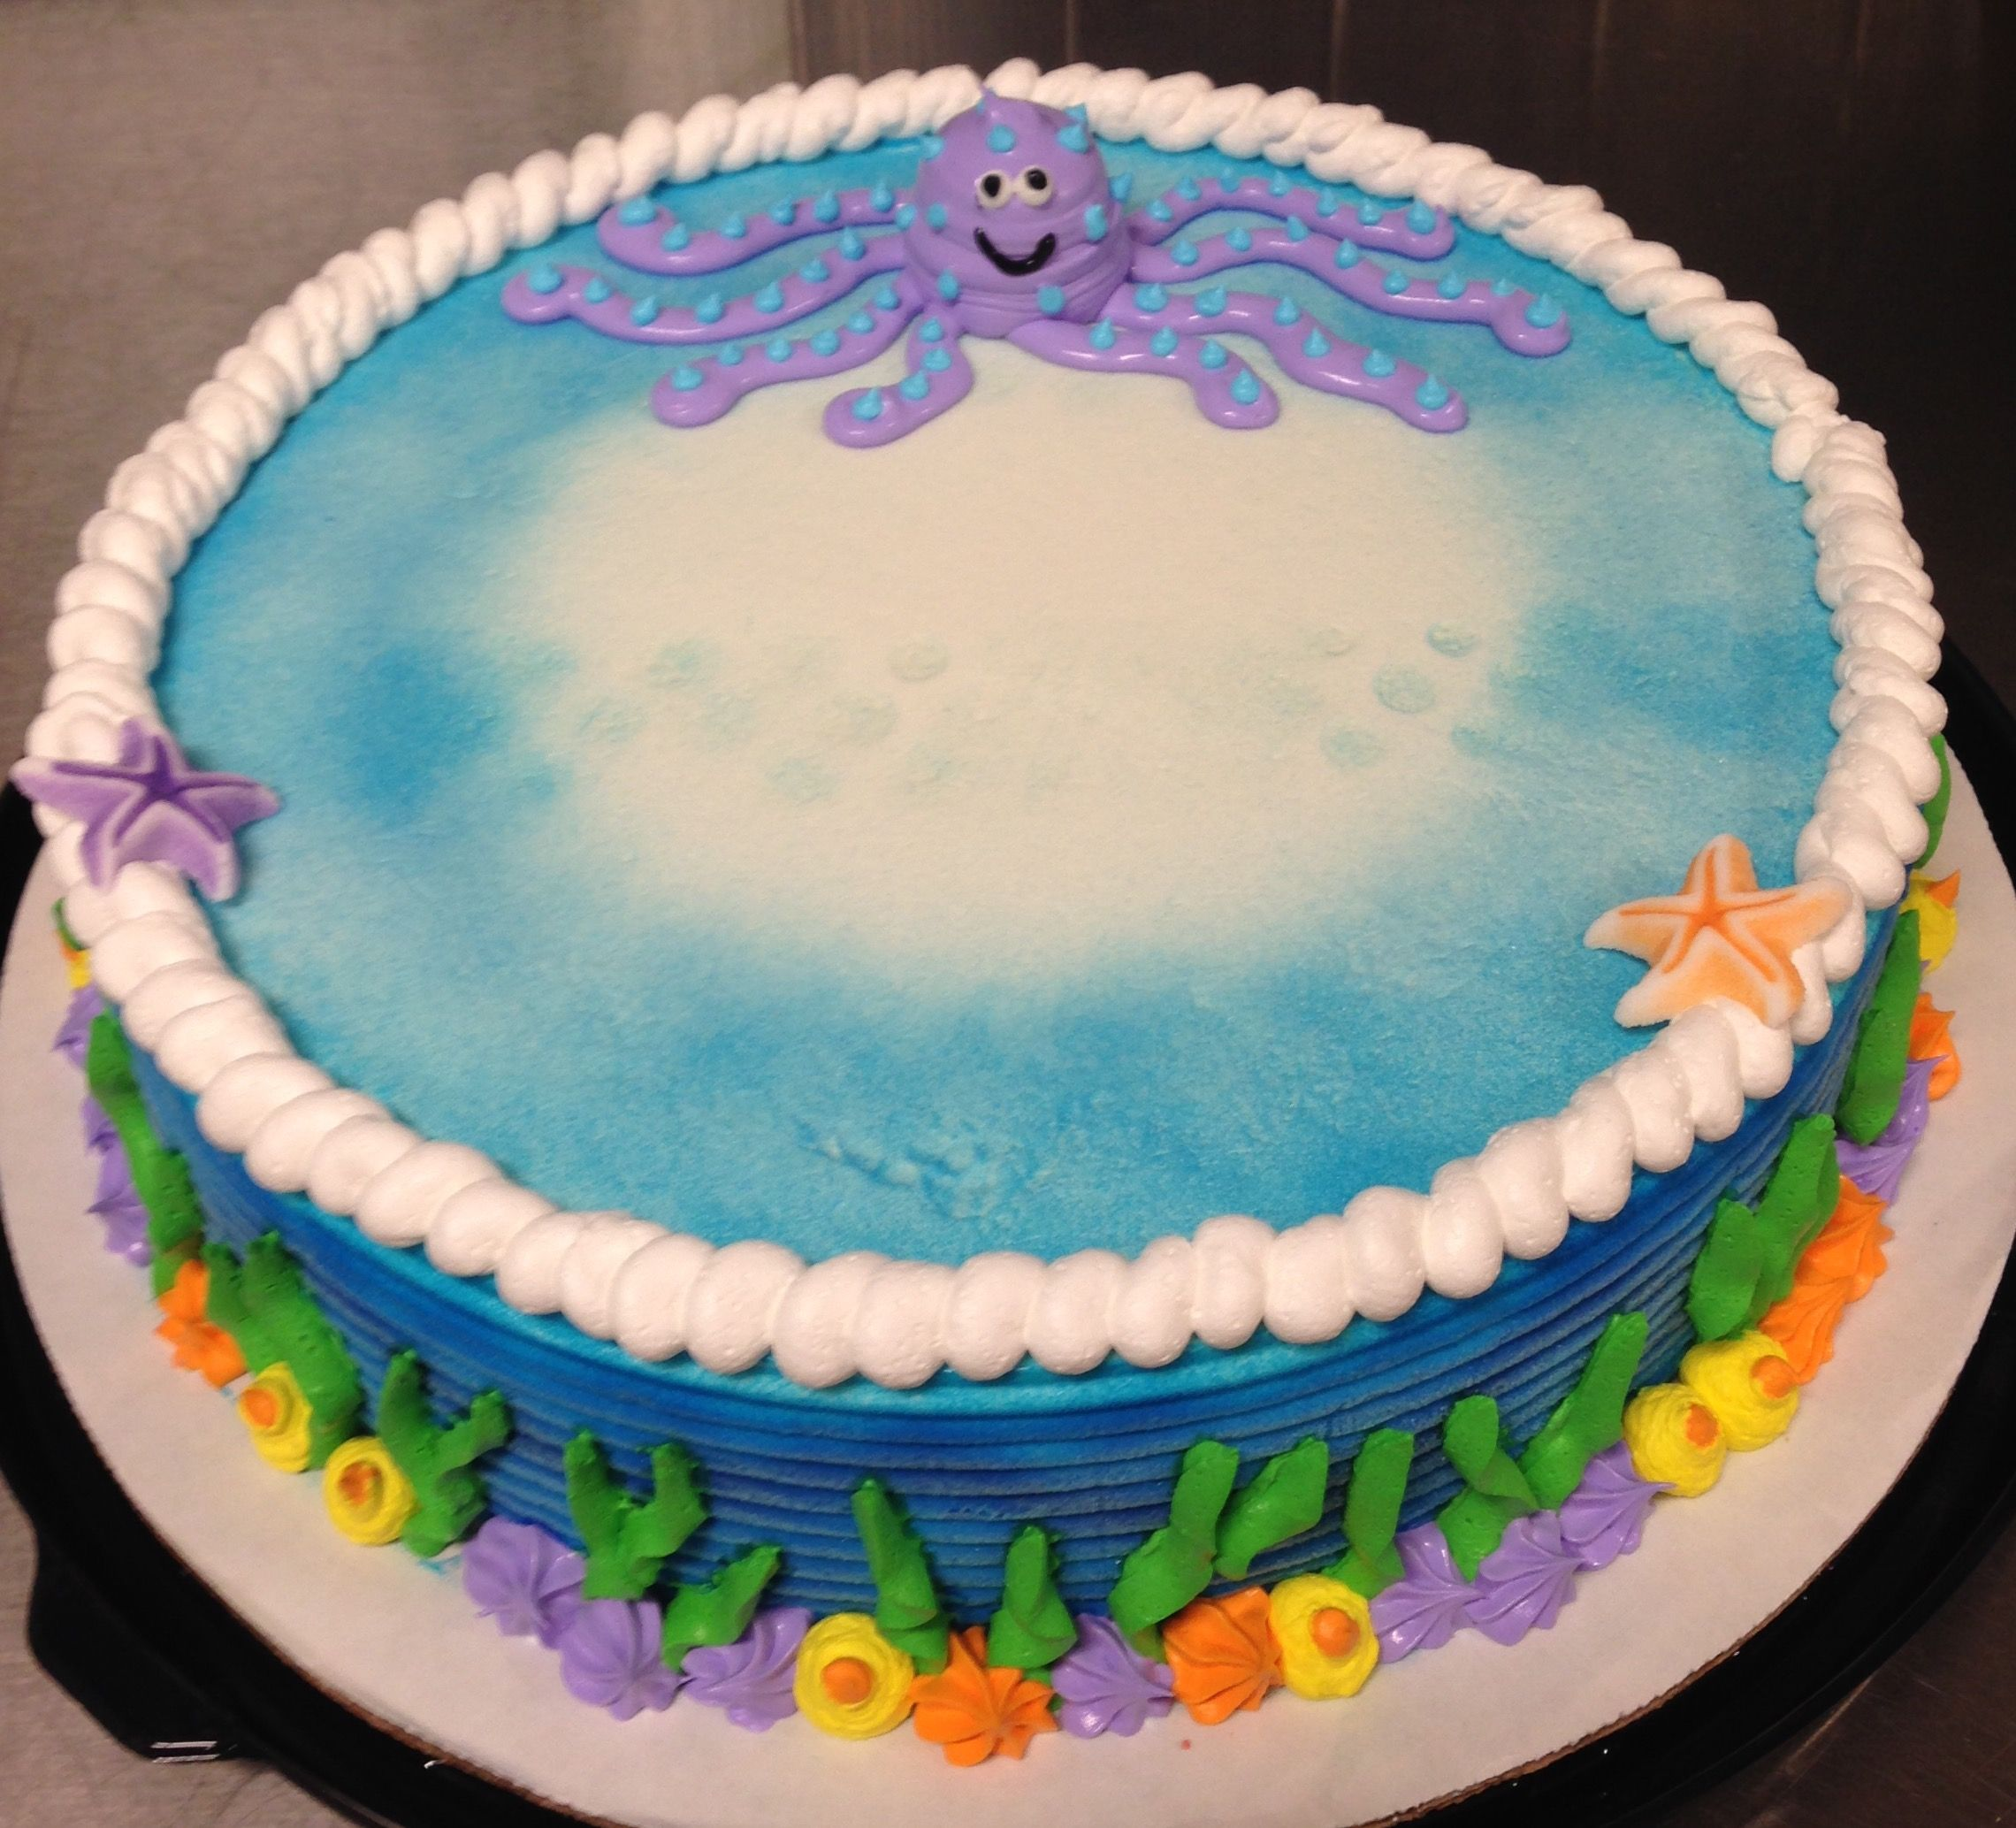 Pin by Diana Bragg Schwartz on My Cakes Pinterest Cake